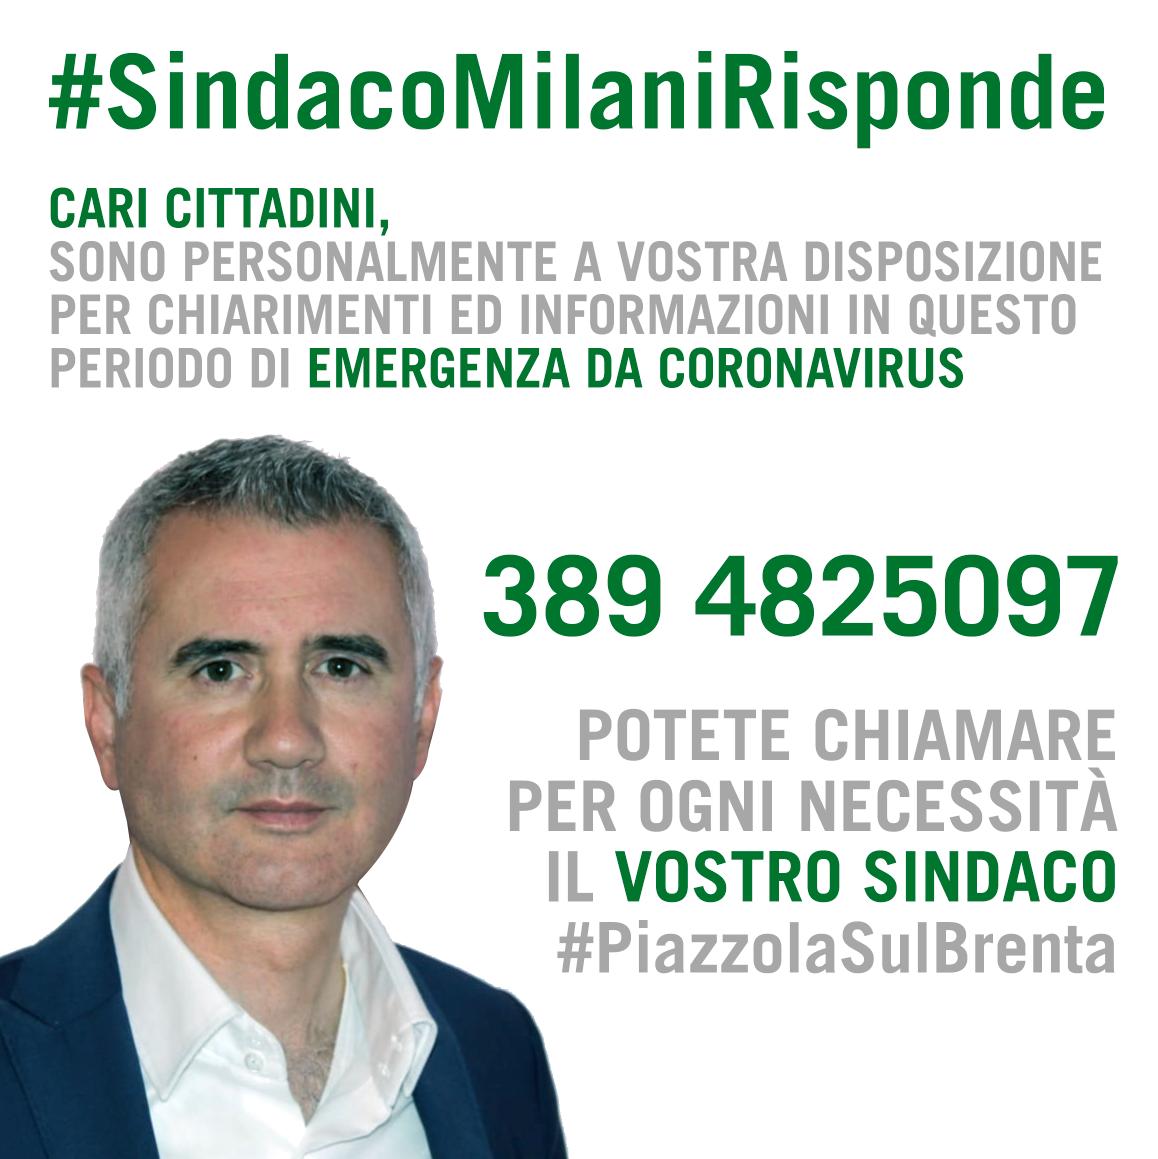 #SindacoMilaniRisponde